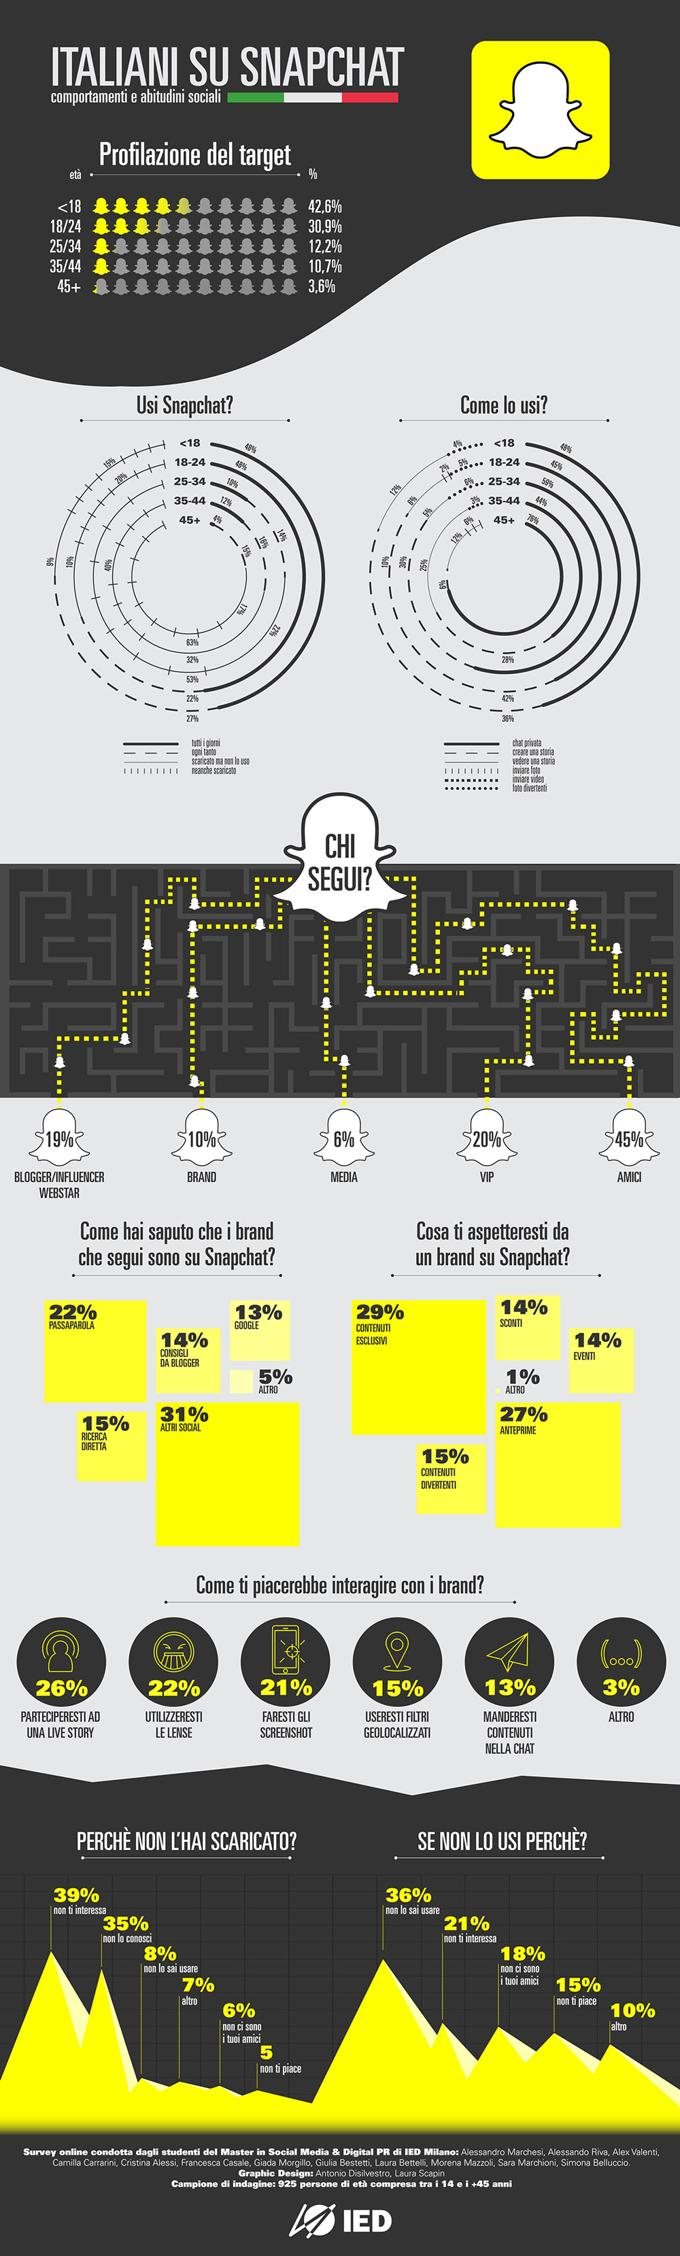 Infografica Ied Snapchat